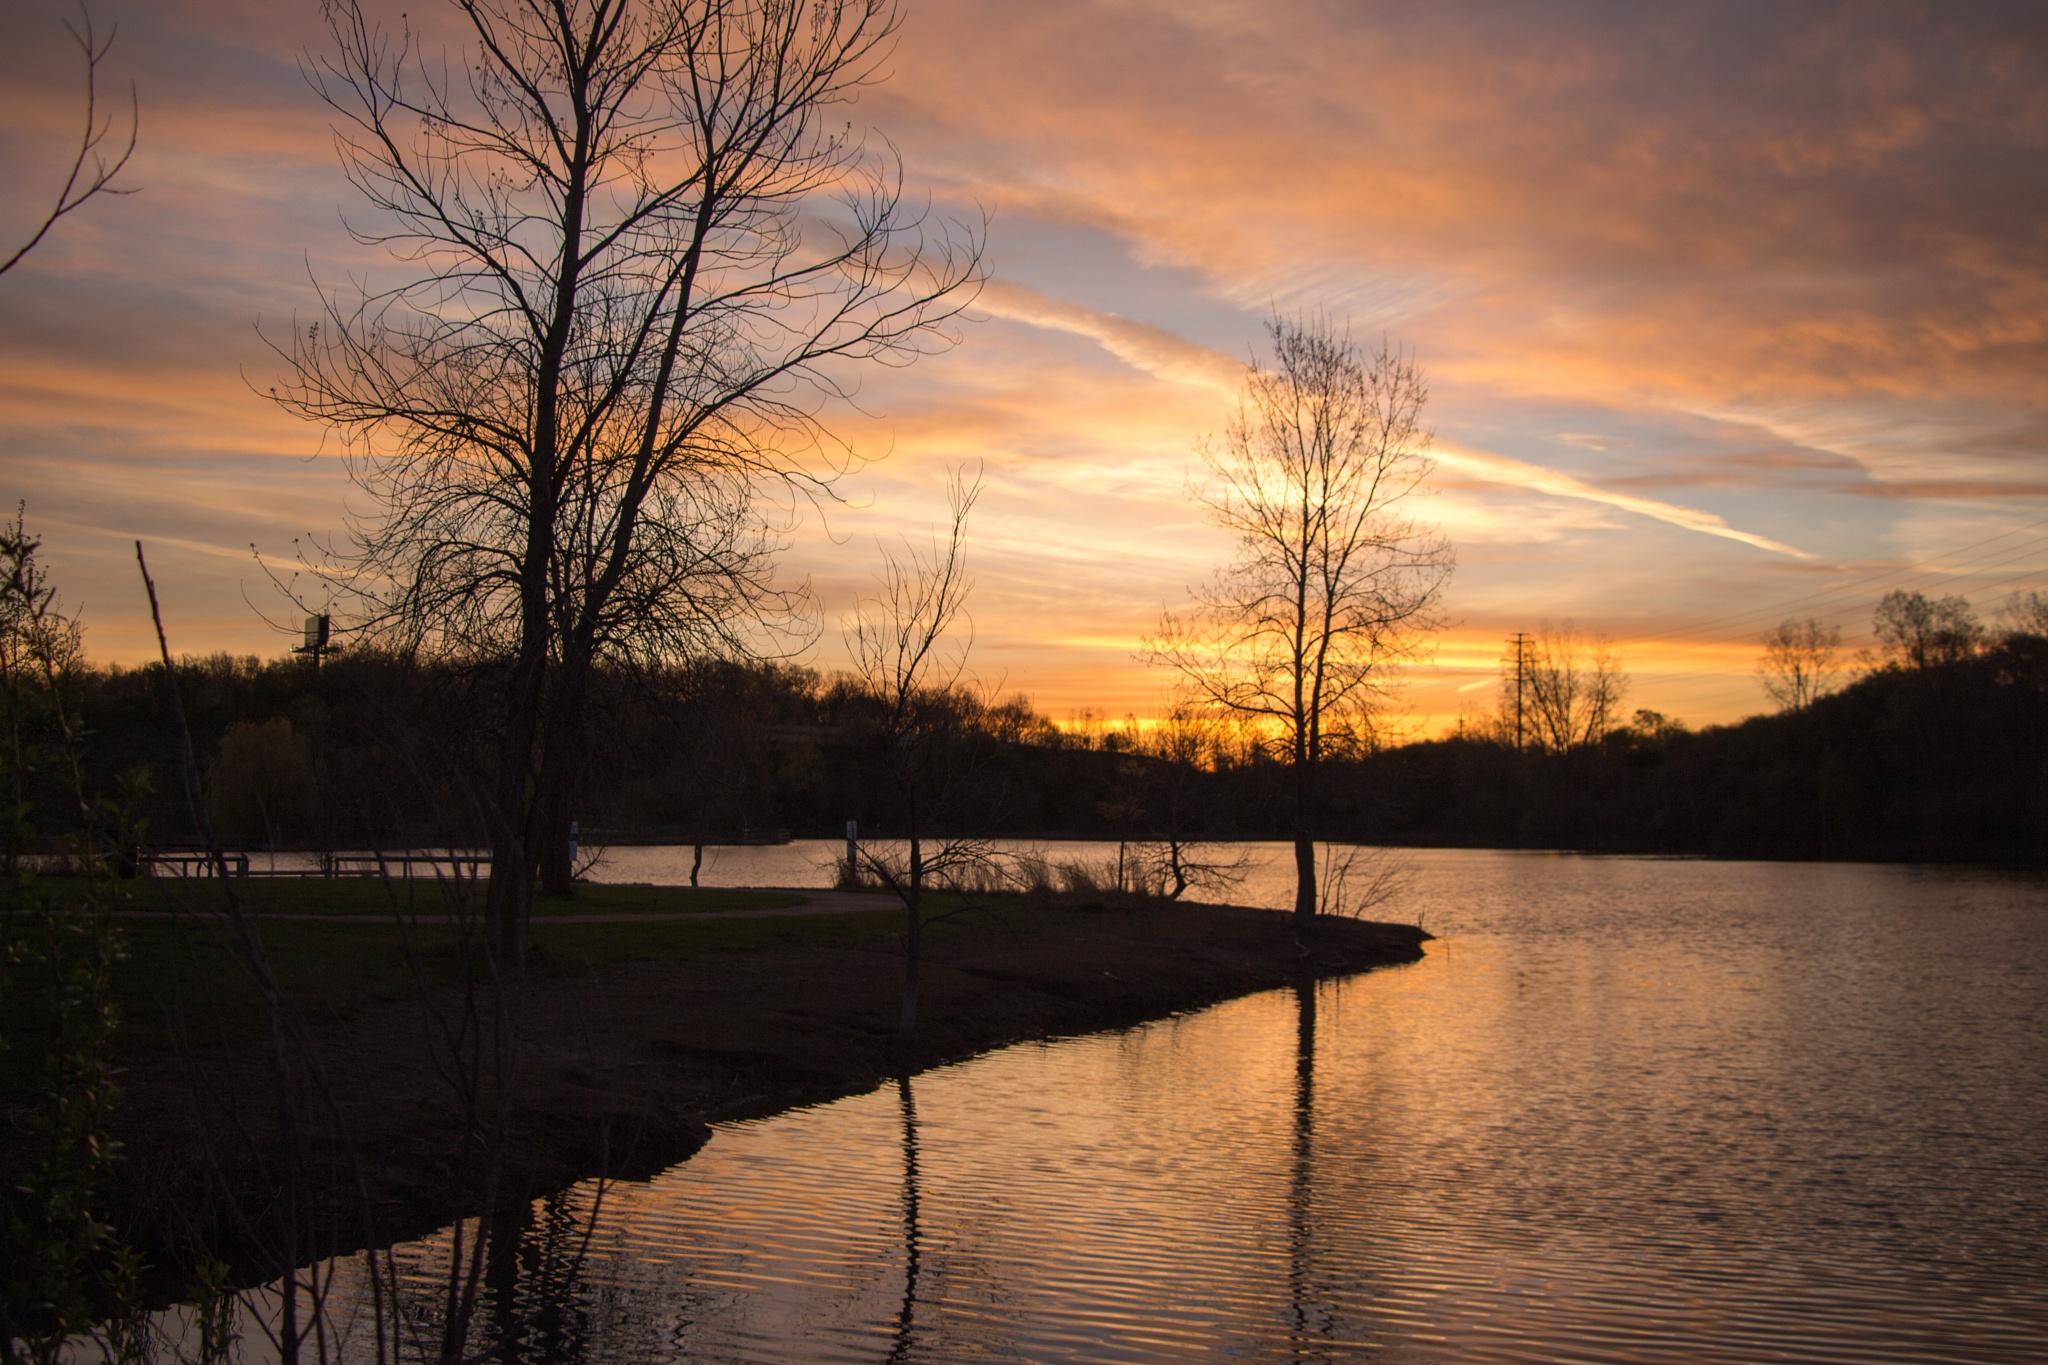 Sunrise Landscape by David_N